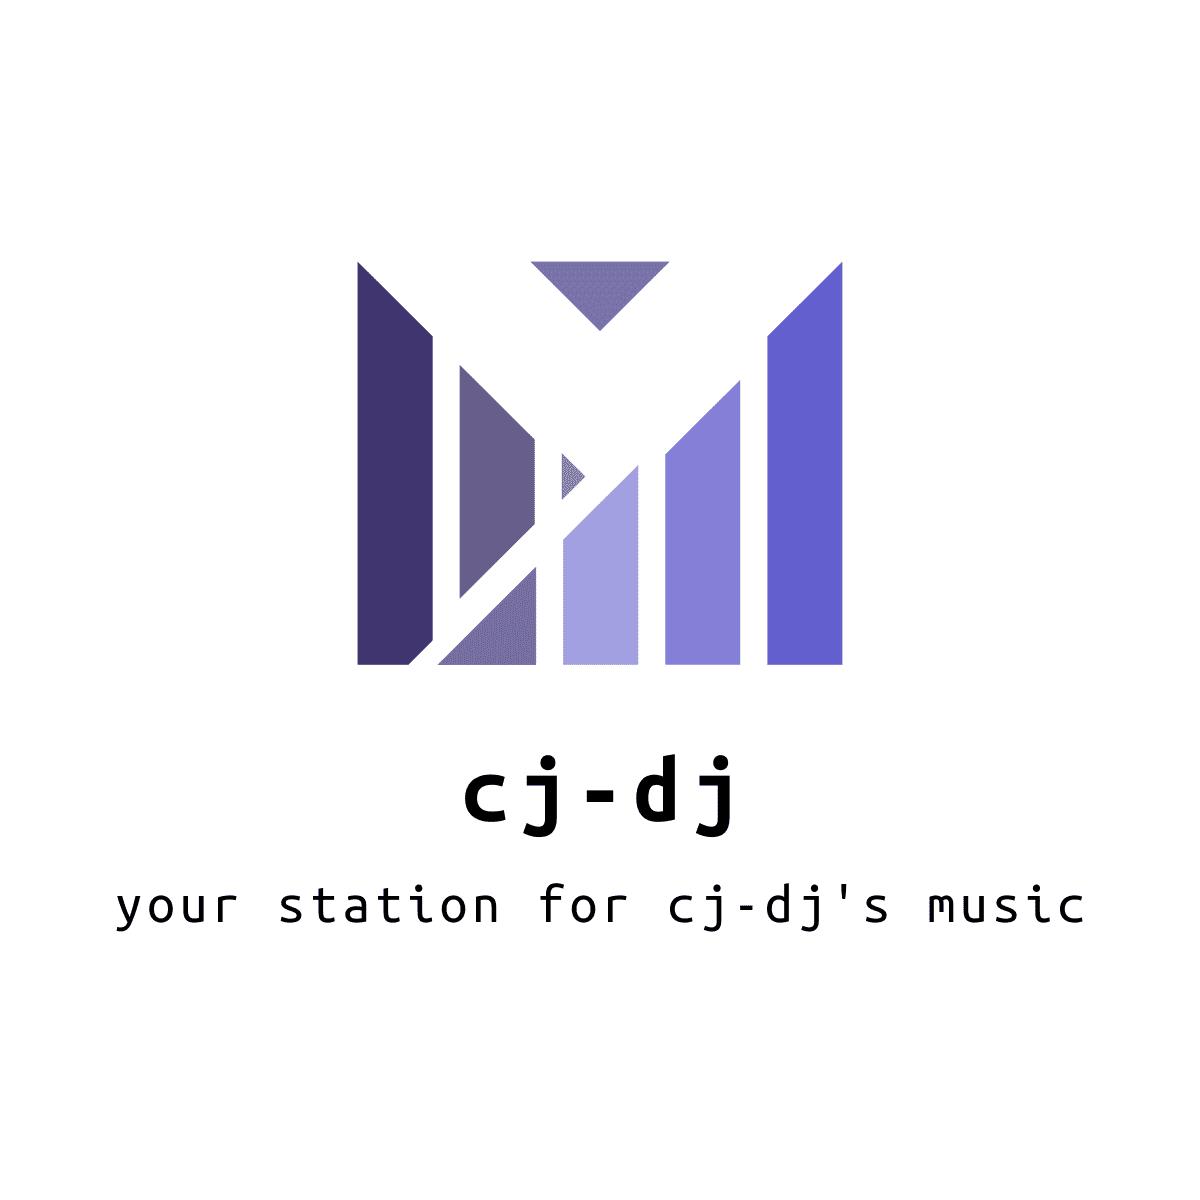 cj-dj on shoutcast